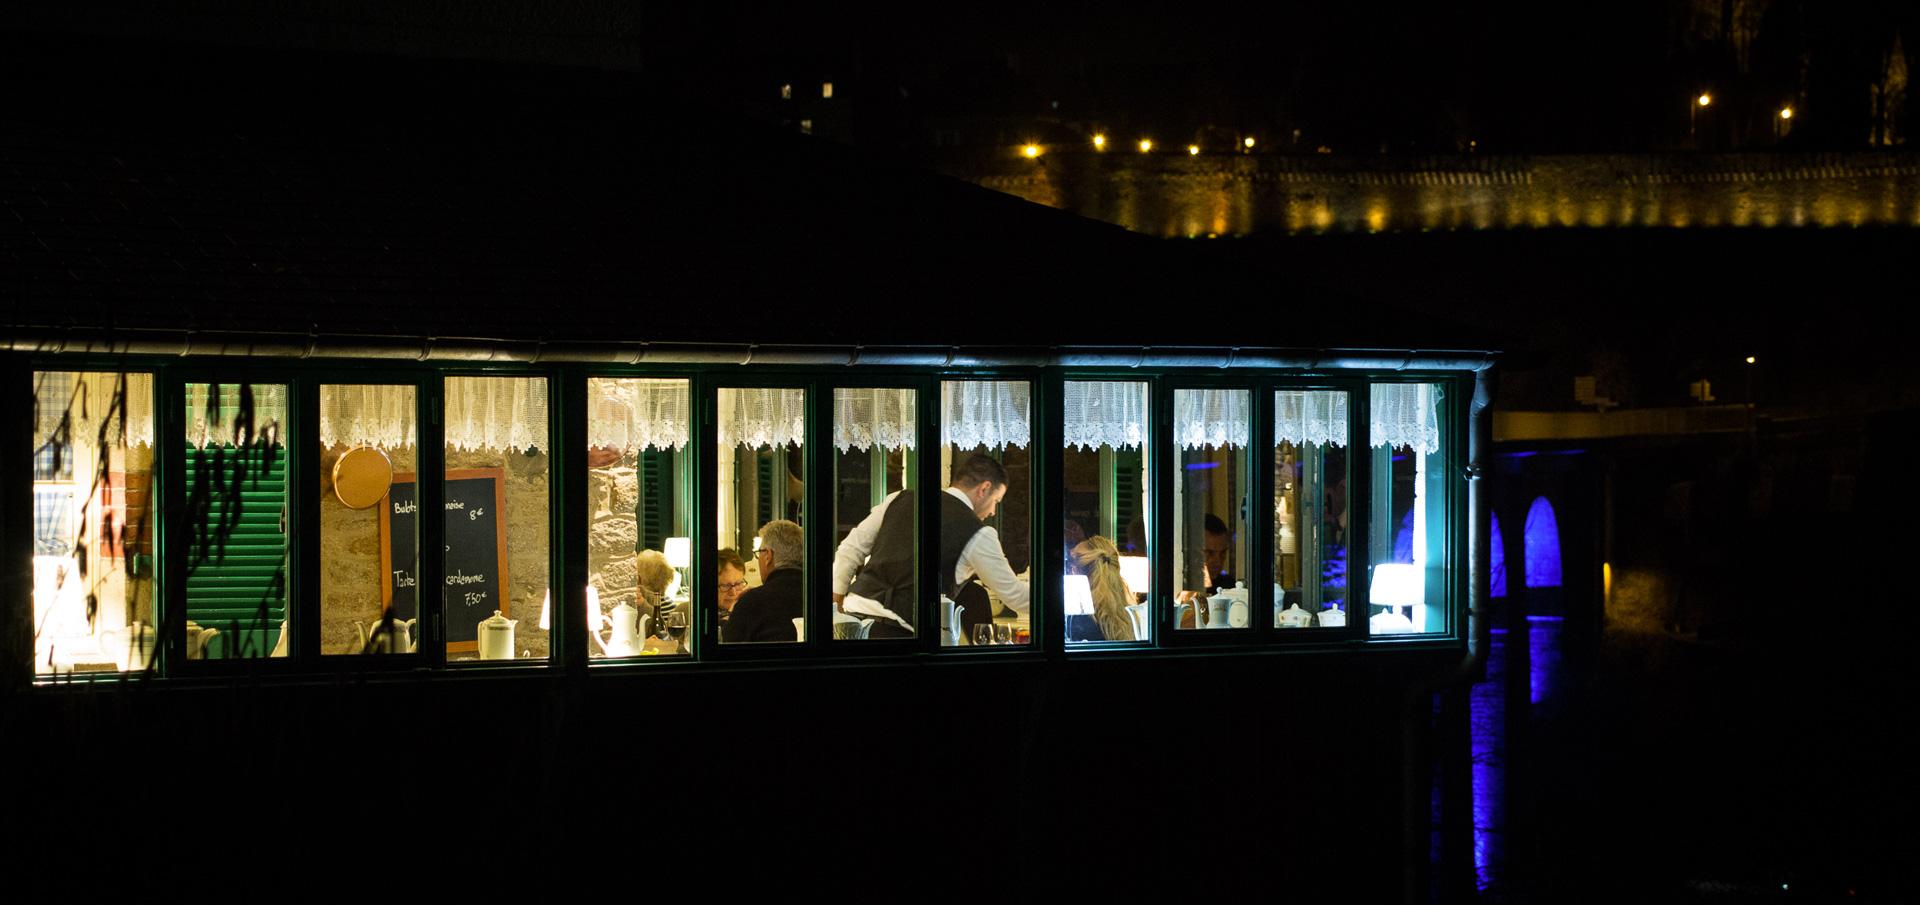 Bistrot-du-viaduc-restaurant-charme-Nuit-lanvallay-dinan